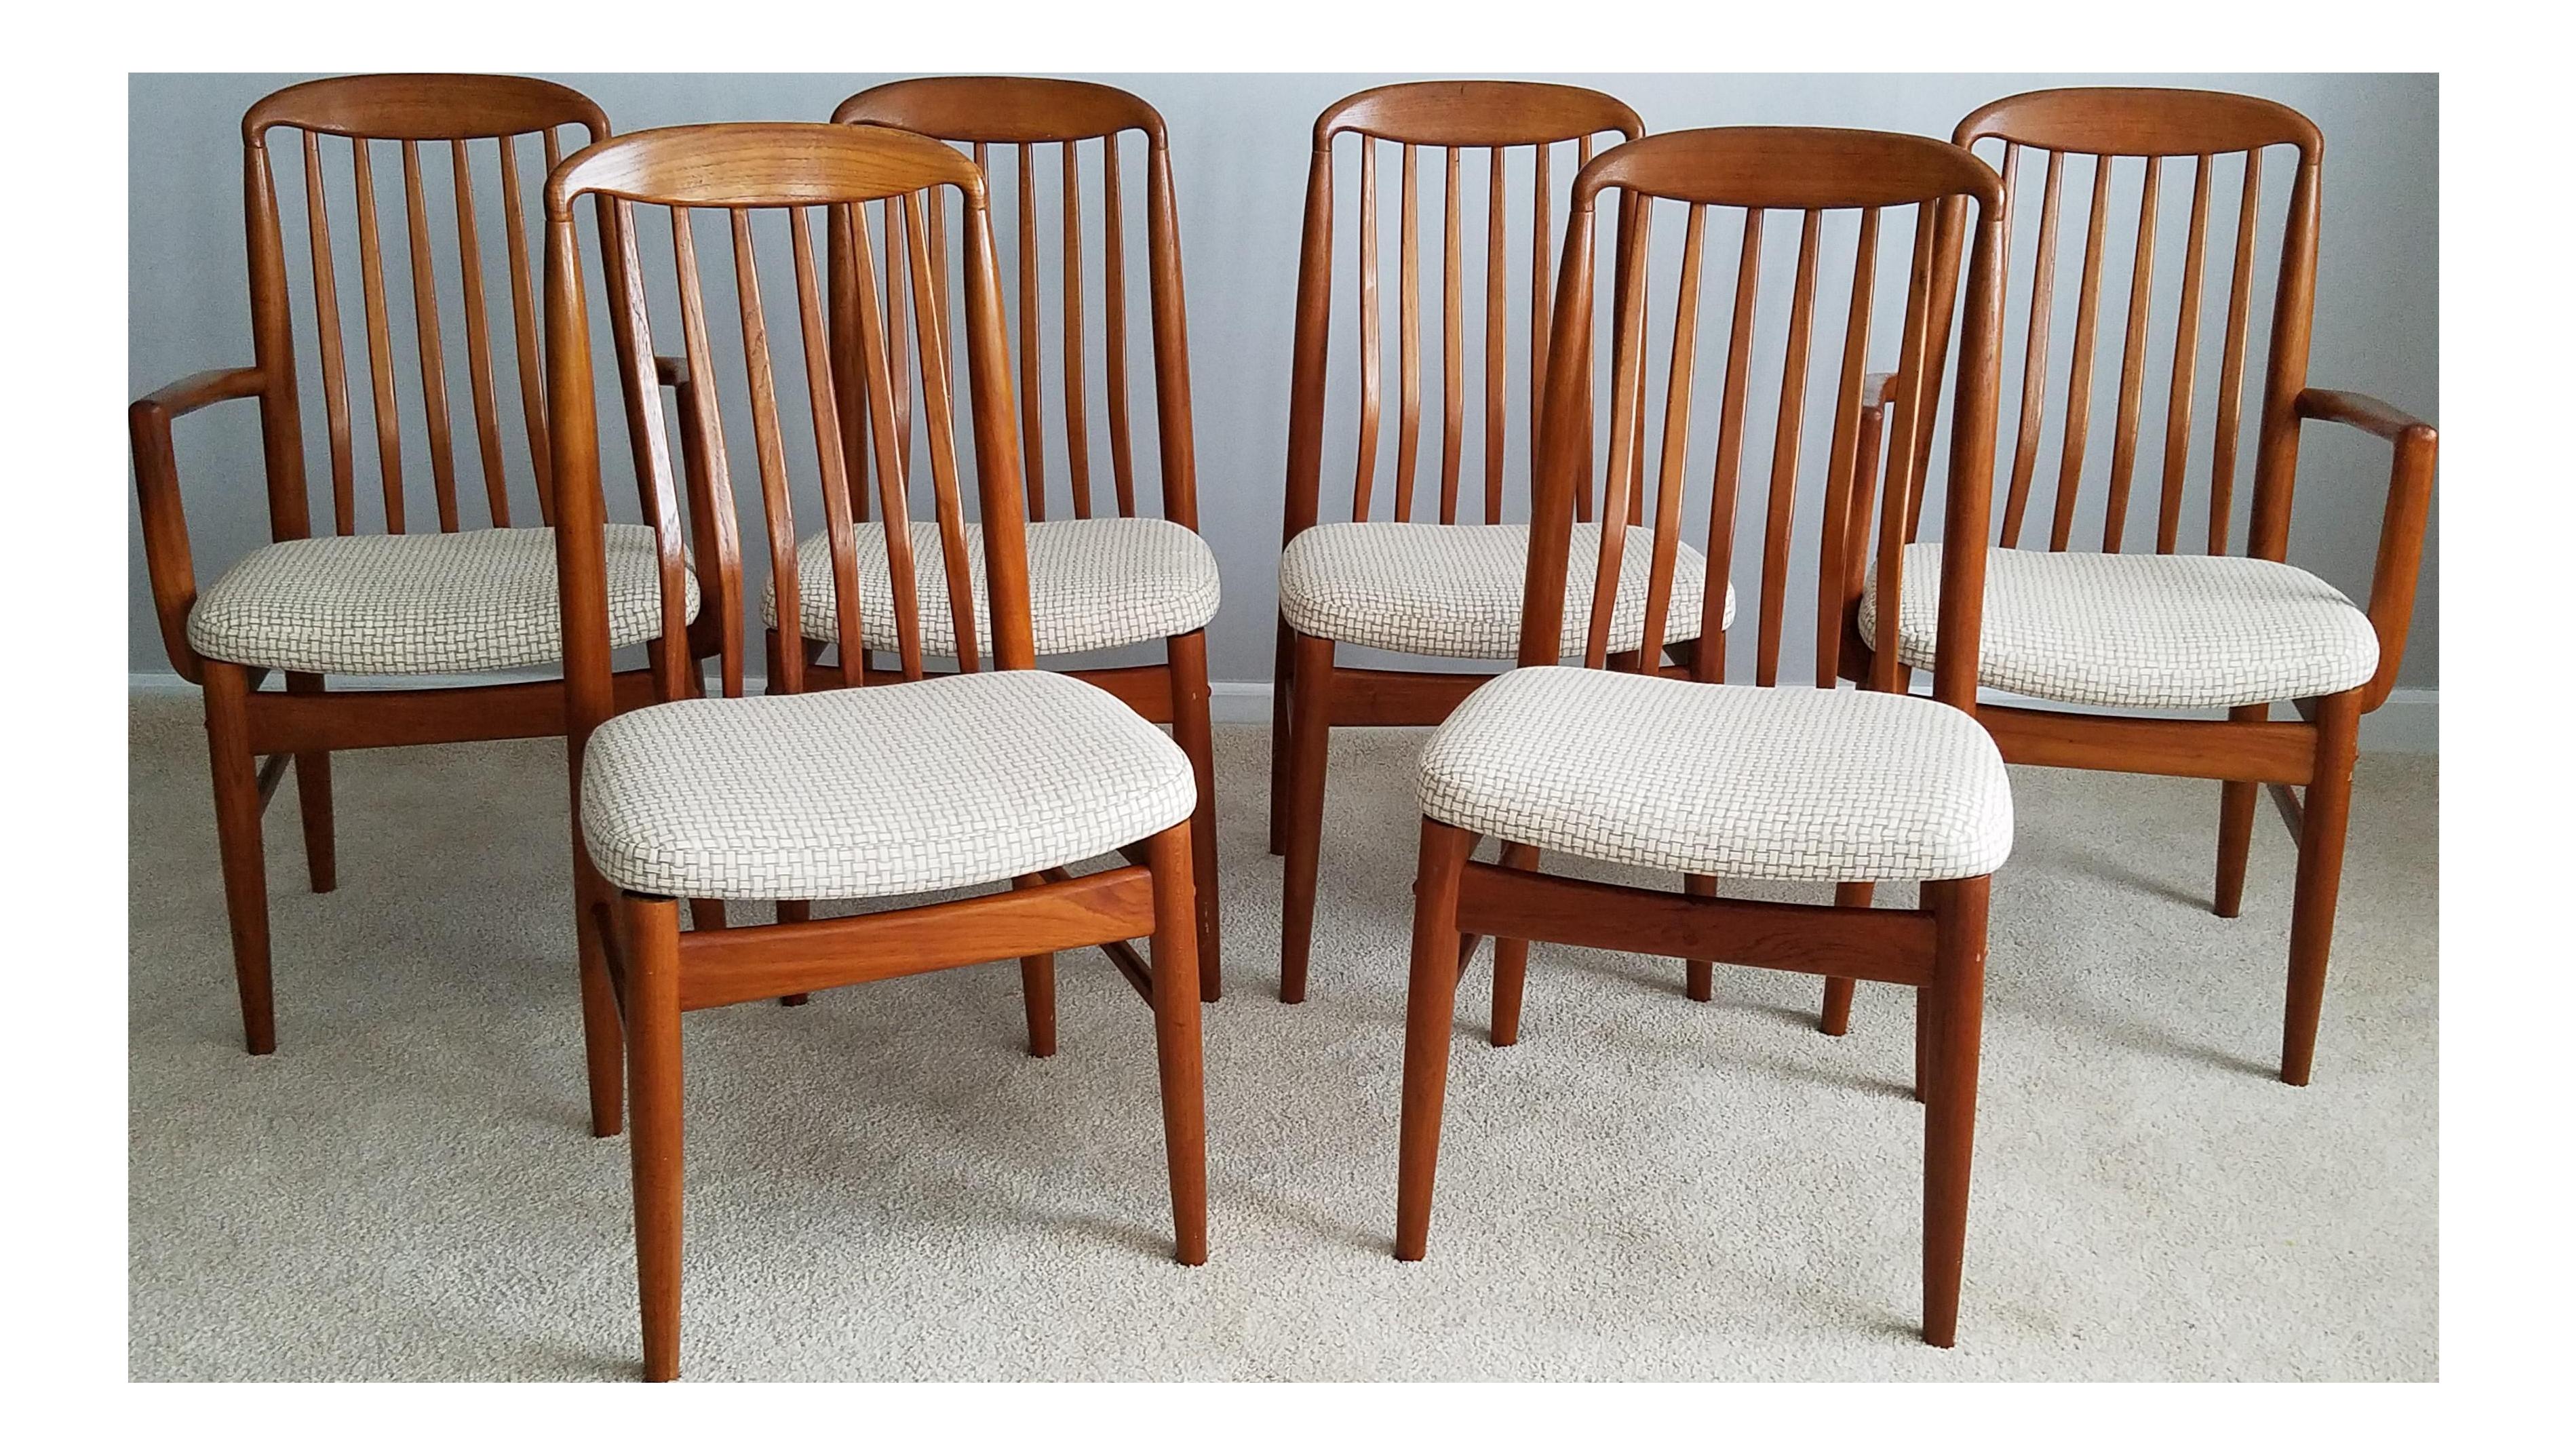 Benny Linden Teak Dining Chairs Set Of 6 Chairish